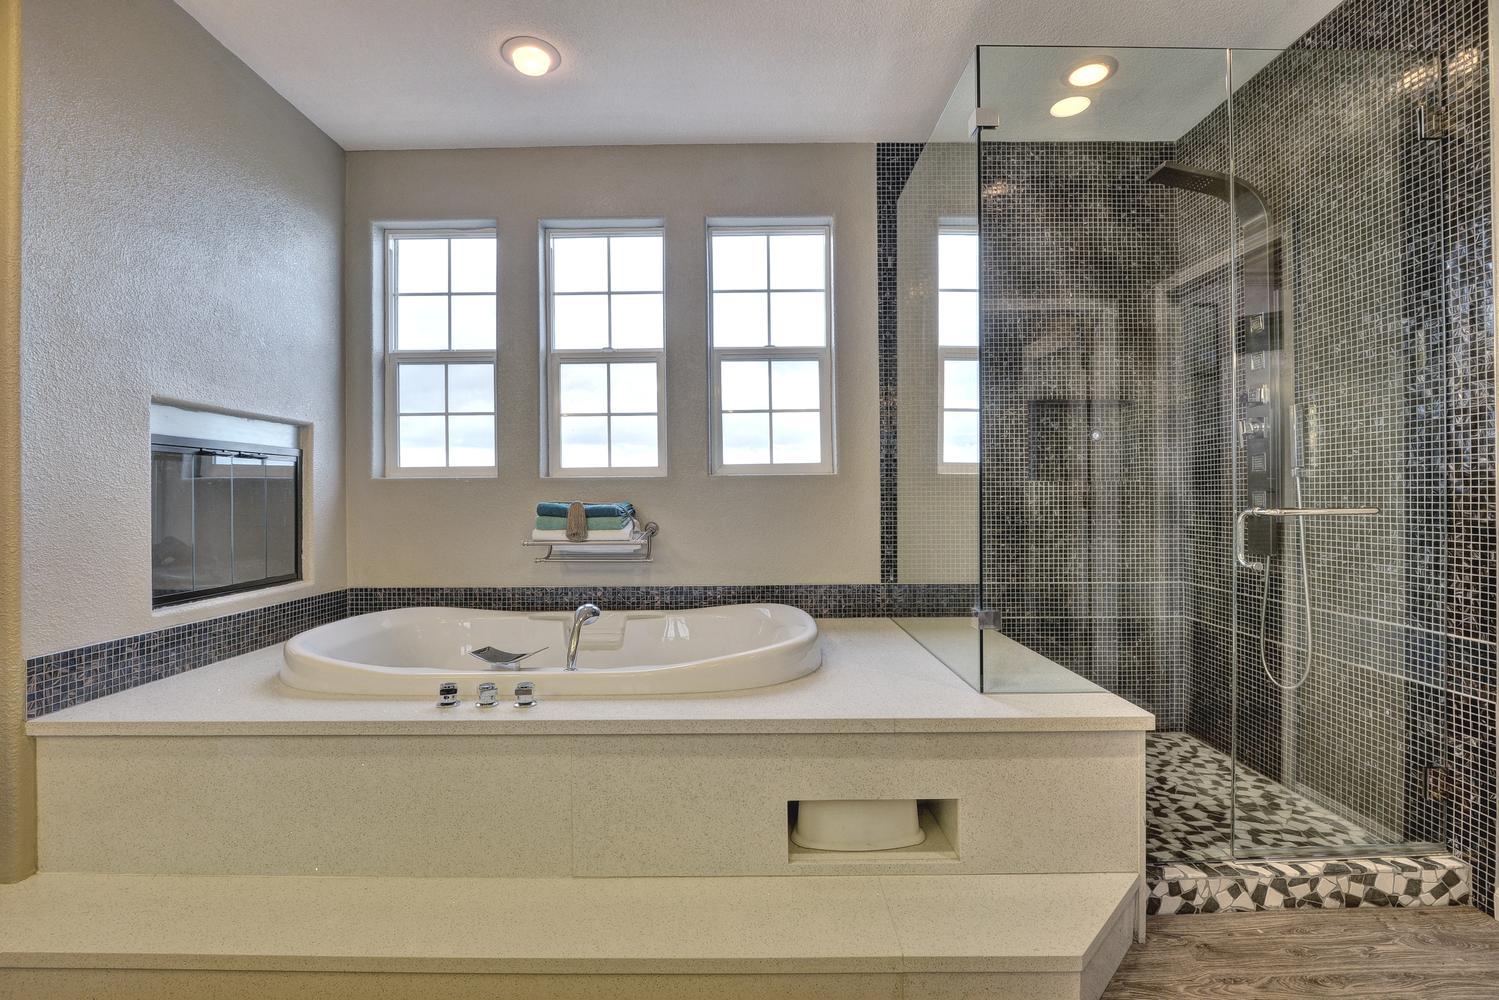 29180 Marshbrook Dr Hayward CA-large-017-Bathtub and Shower-1500x1000-72dpi.jpg